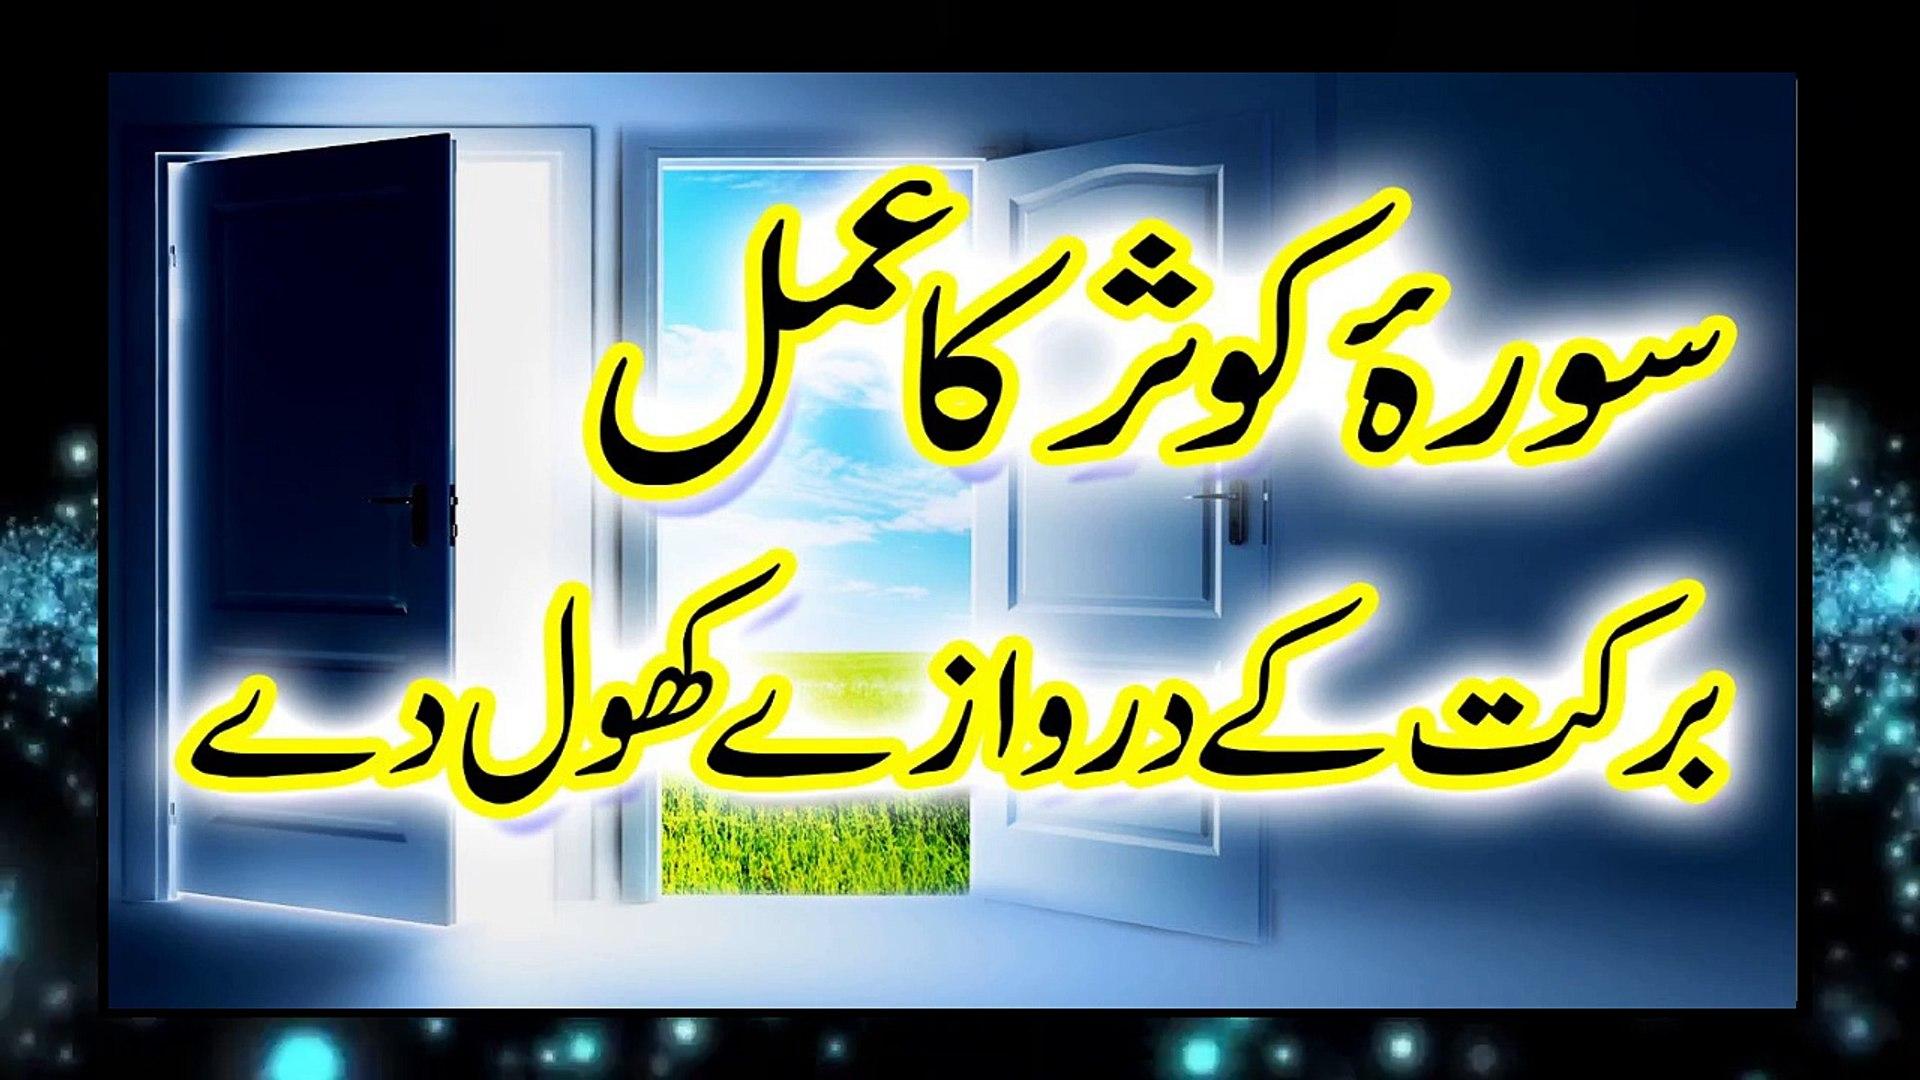 Surah-e-Kosar ka Amal _ Barkat Kay Darwazay Khool Deta hay _ Powerfull  Wazifa For Rizq Urdu